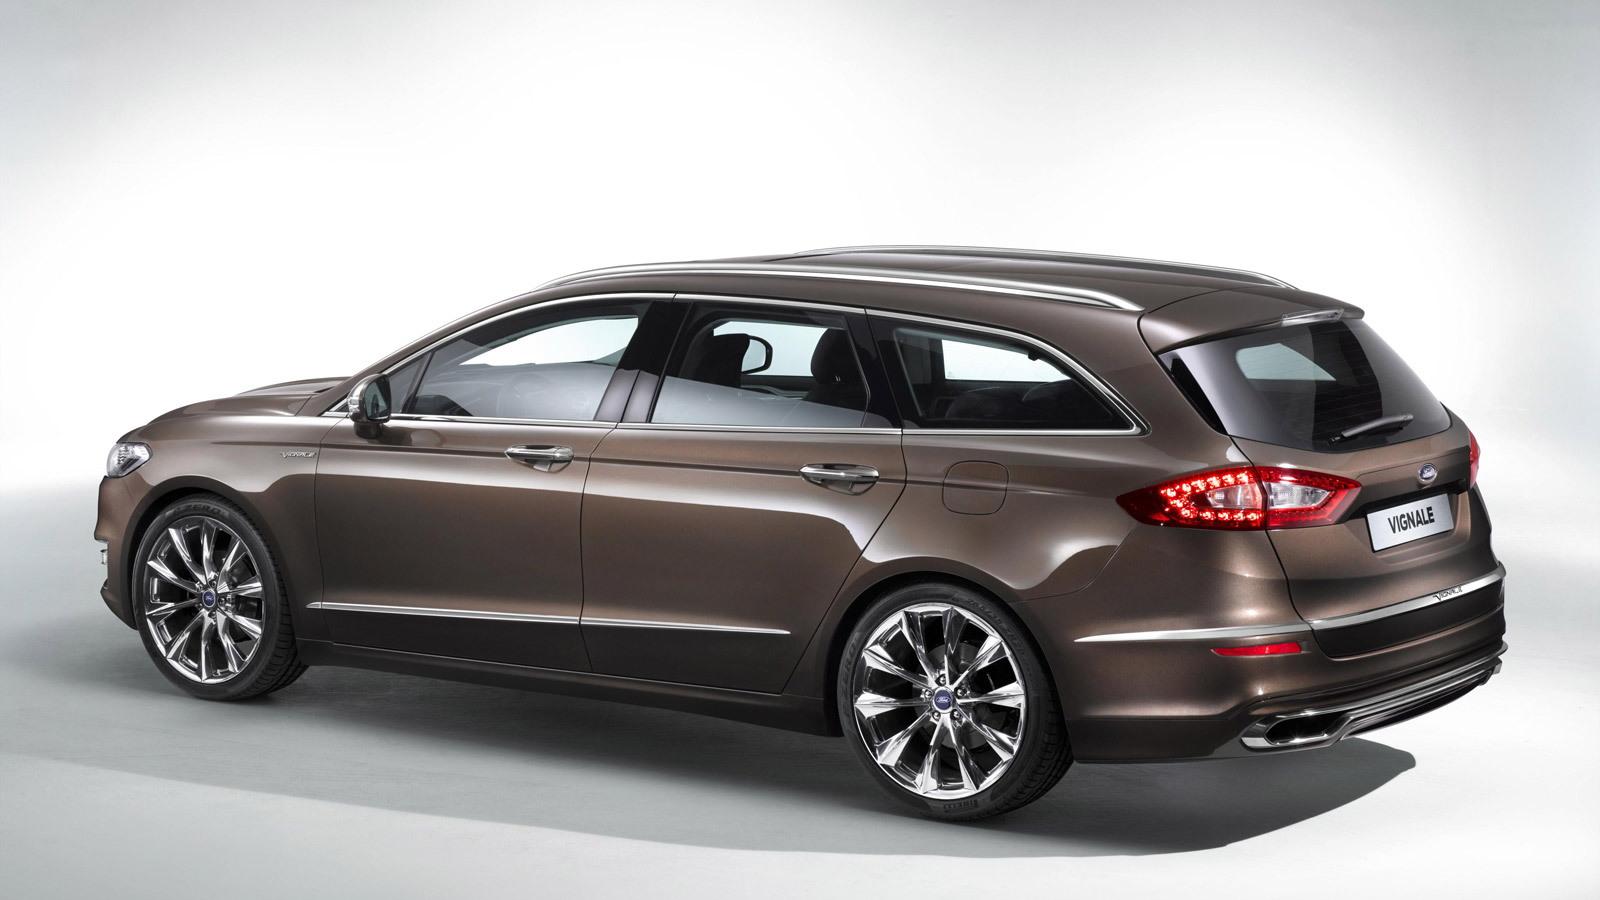 Ford Mondeo Vignale concept, 2013 Frankfurt Auto Show